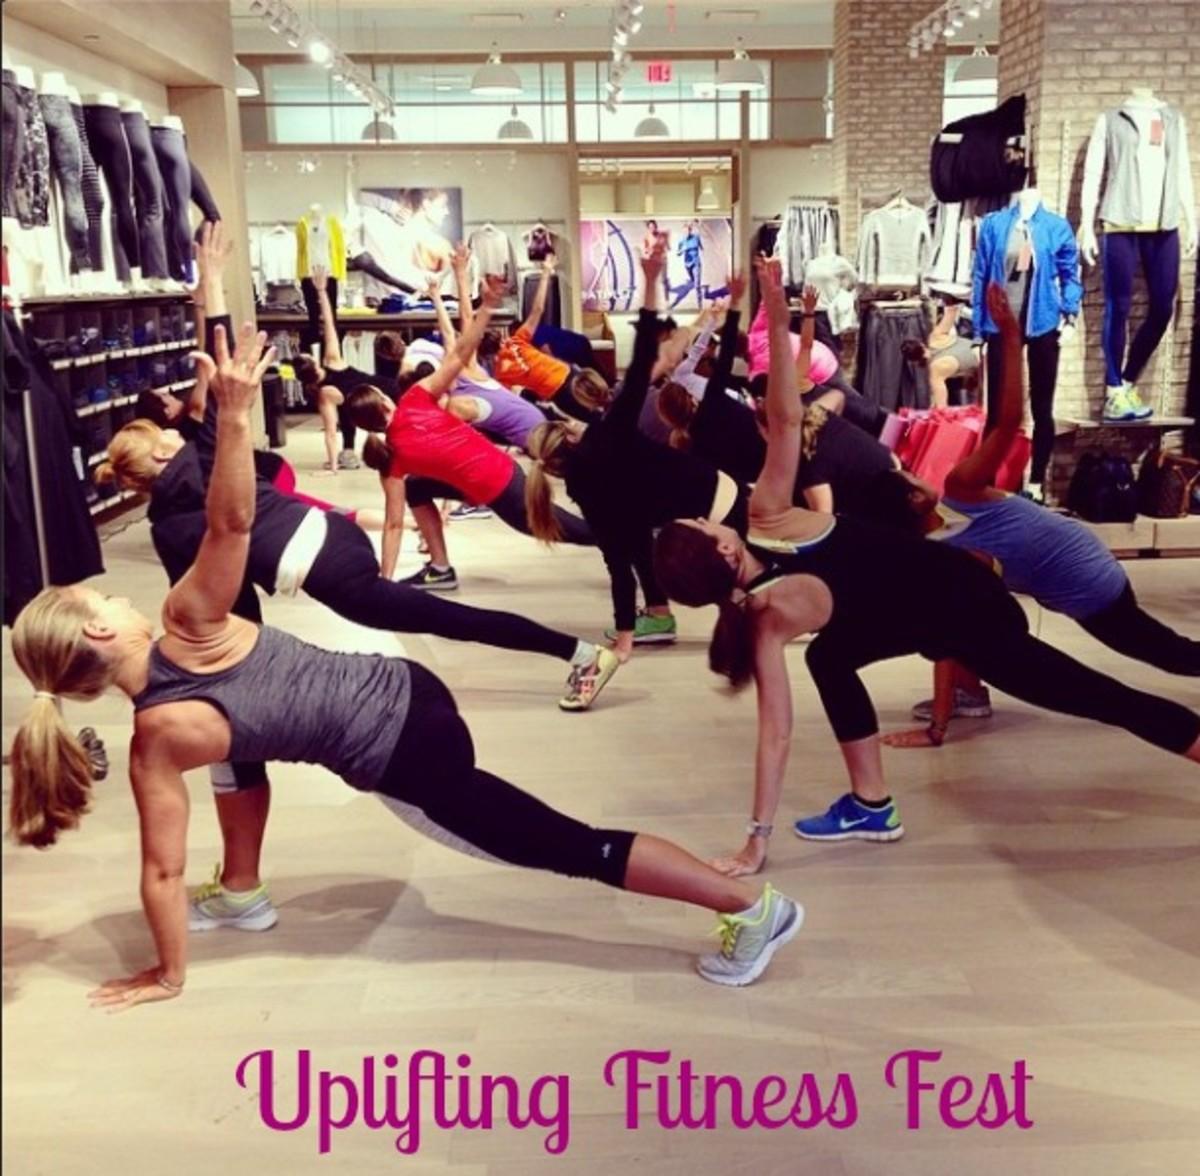 Uplifting Fitness Fest